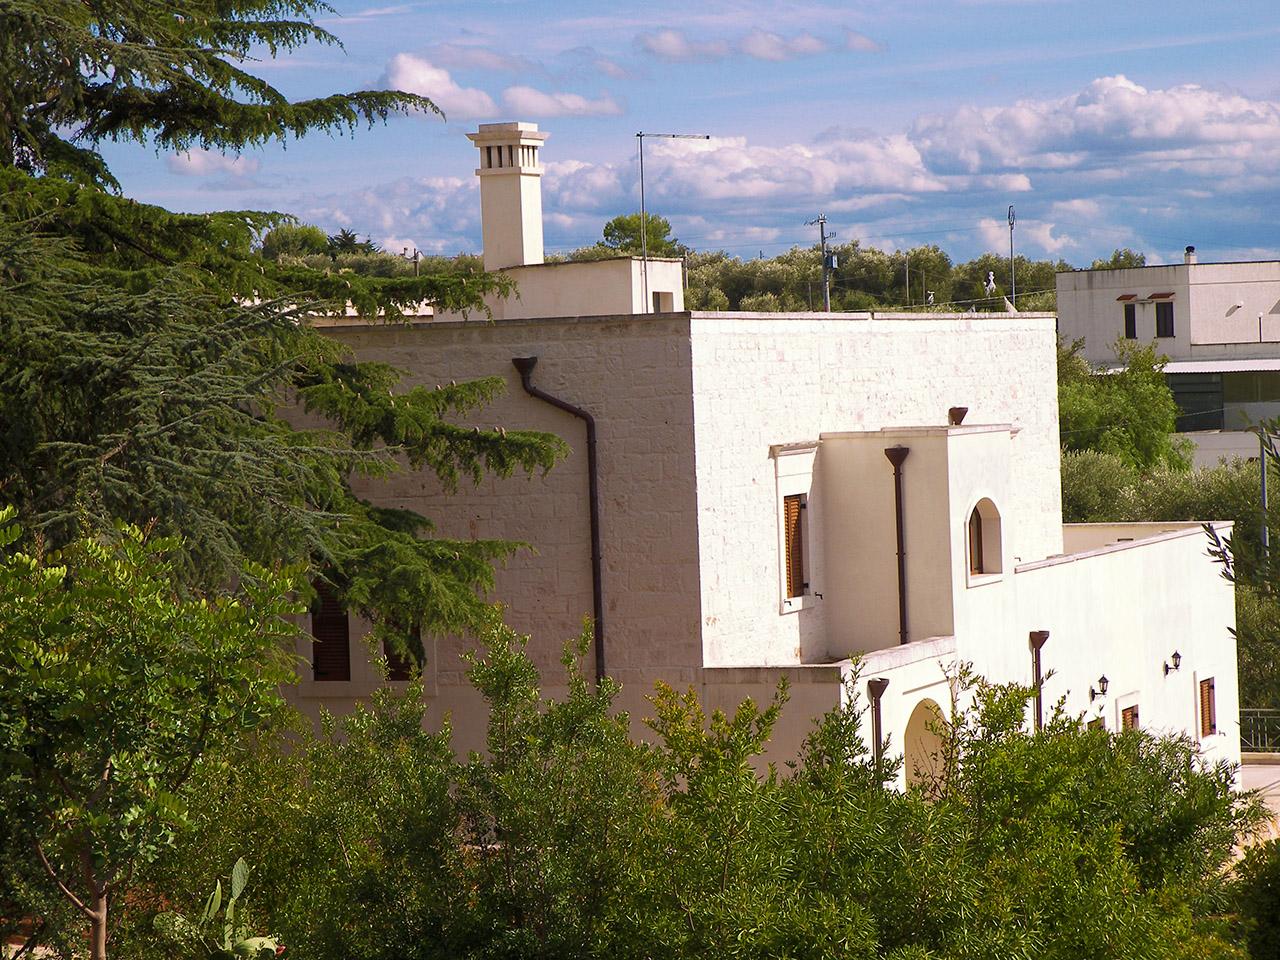 costruzioni restauri sirio ostuni restauro ristrutturazione casina fumarola ostuni 100 3114